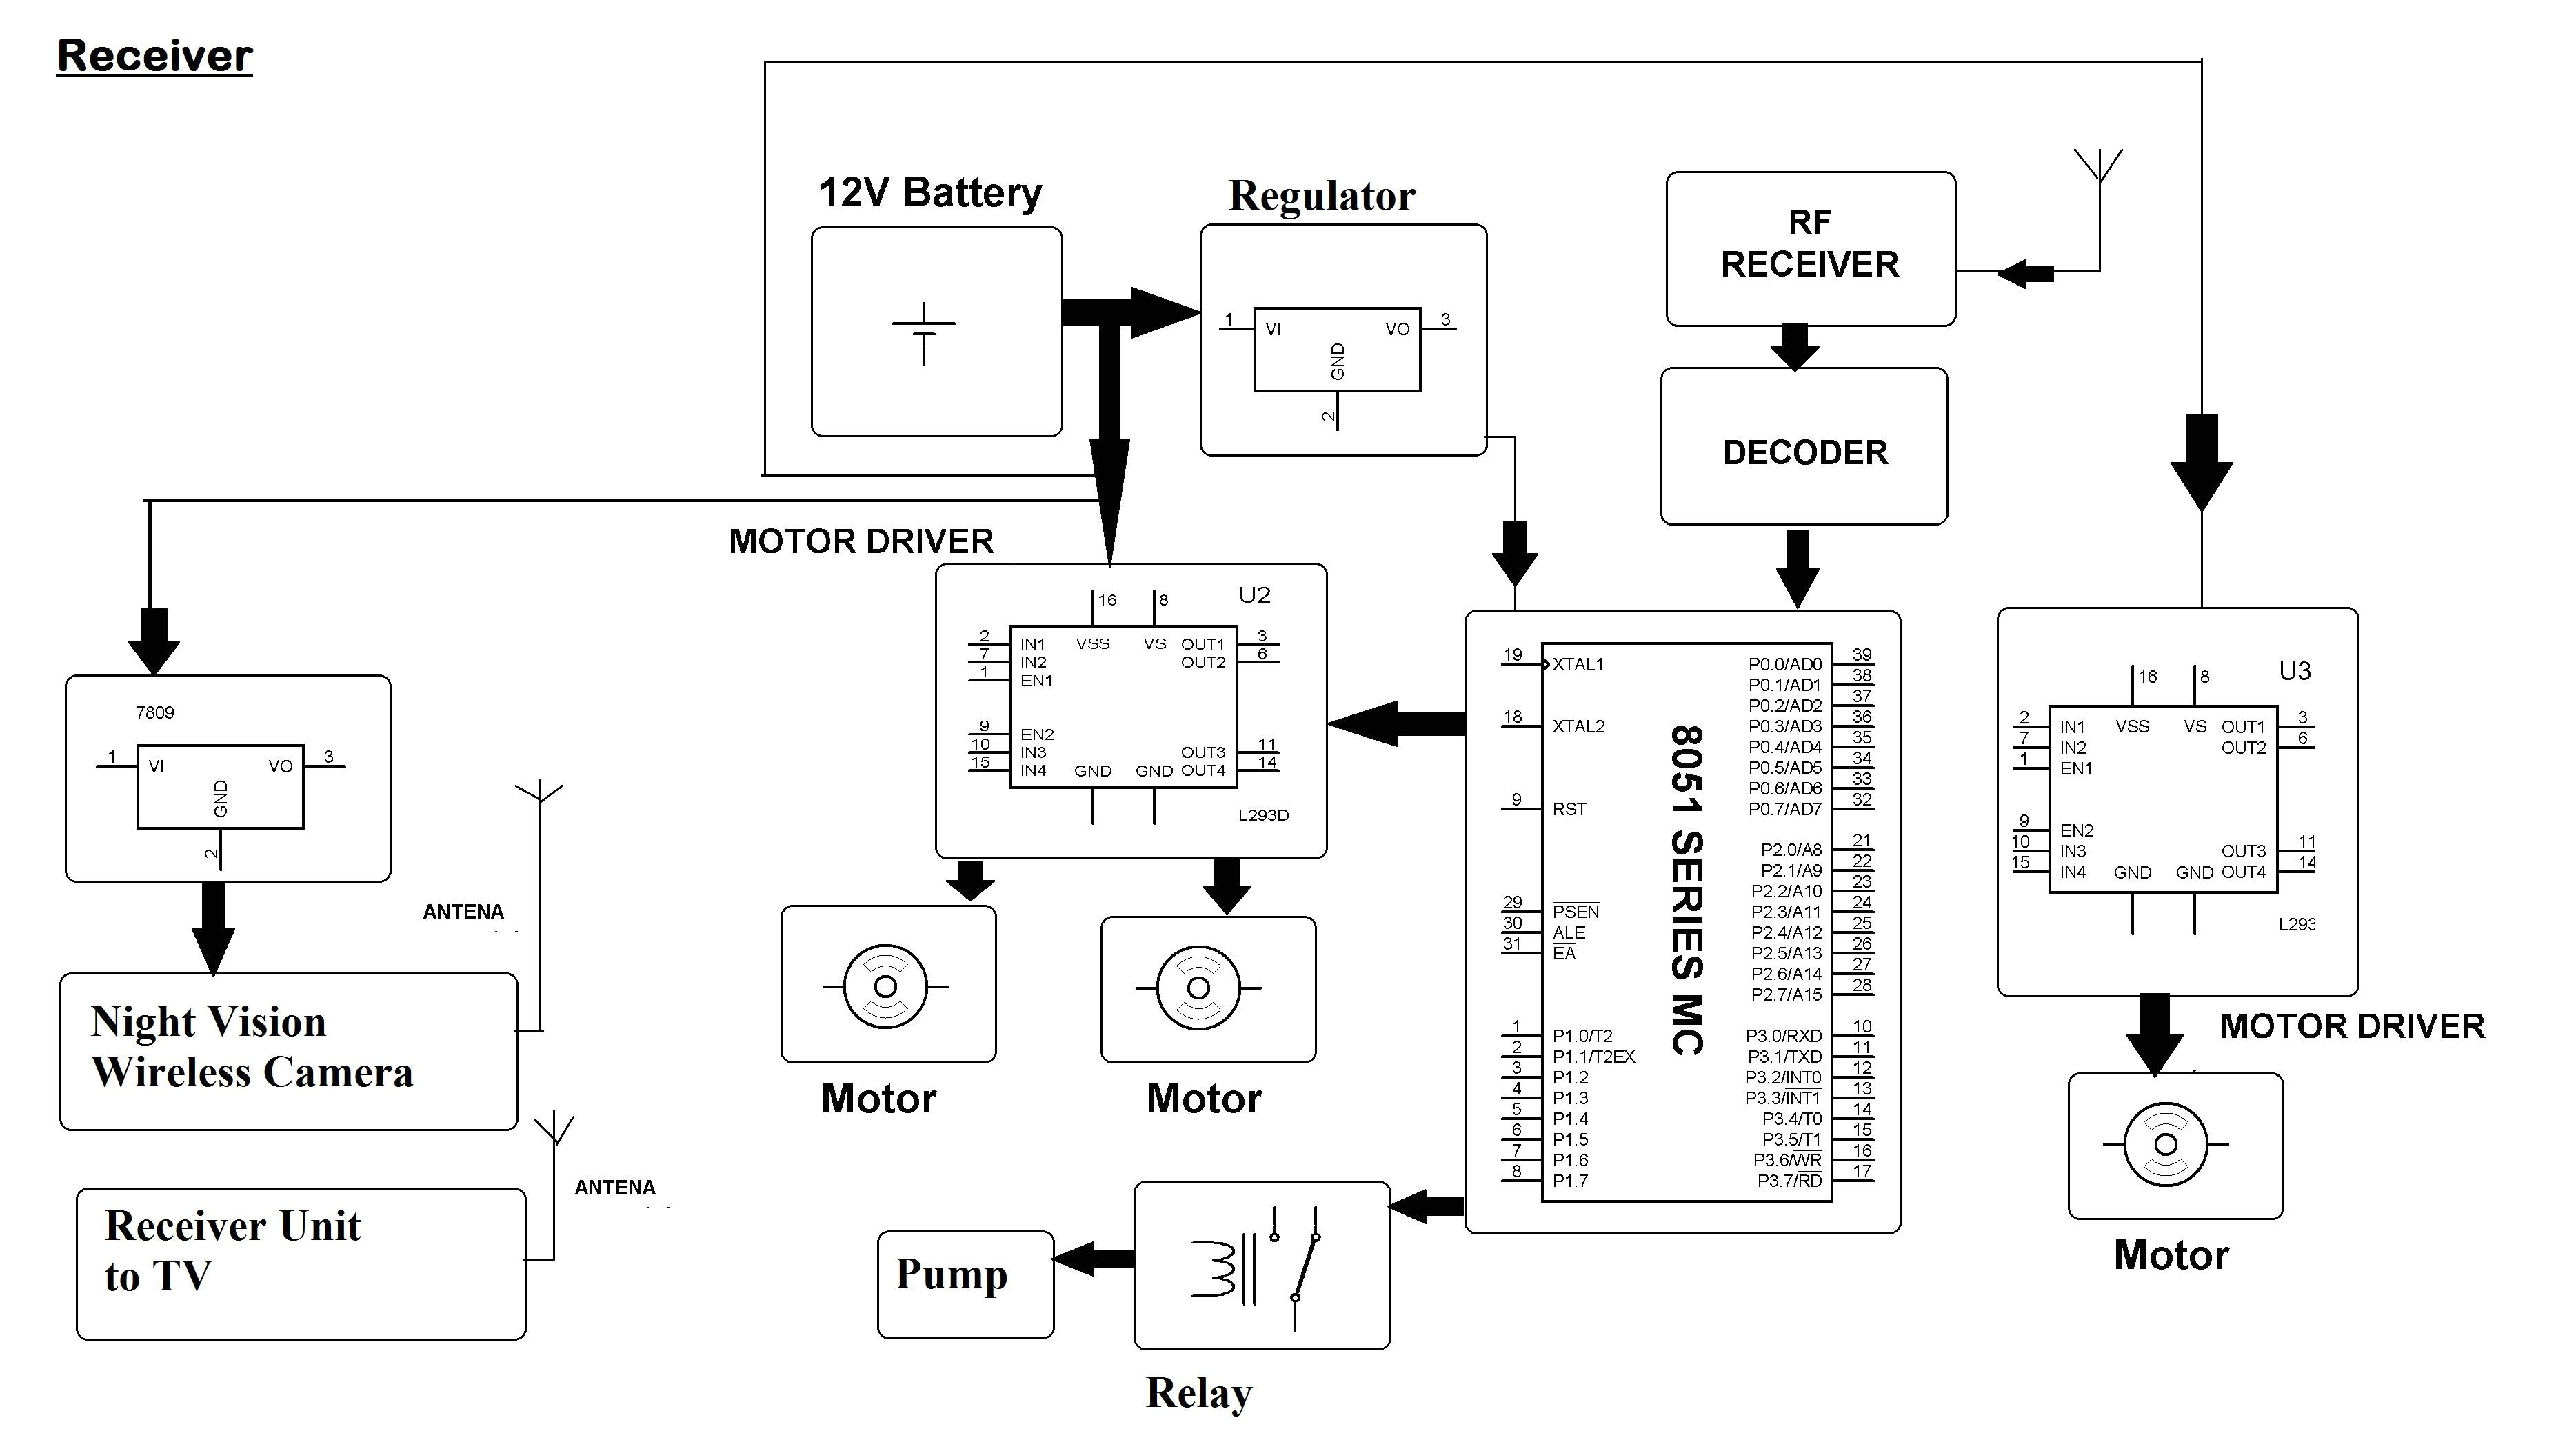 sony ccd wiring diagram my wiring diagram sony 1 3 ccd camera wiring diagram sony ccd wiring diagram